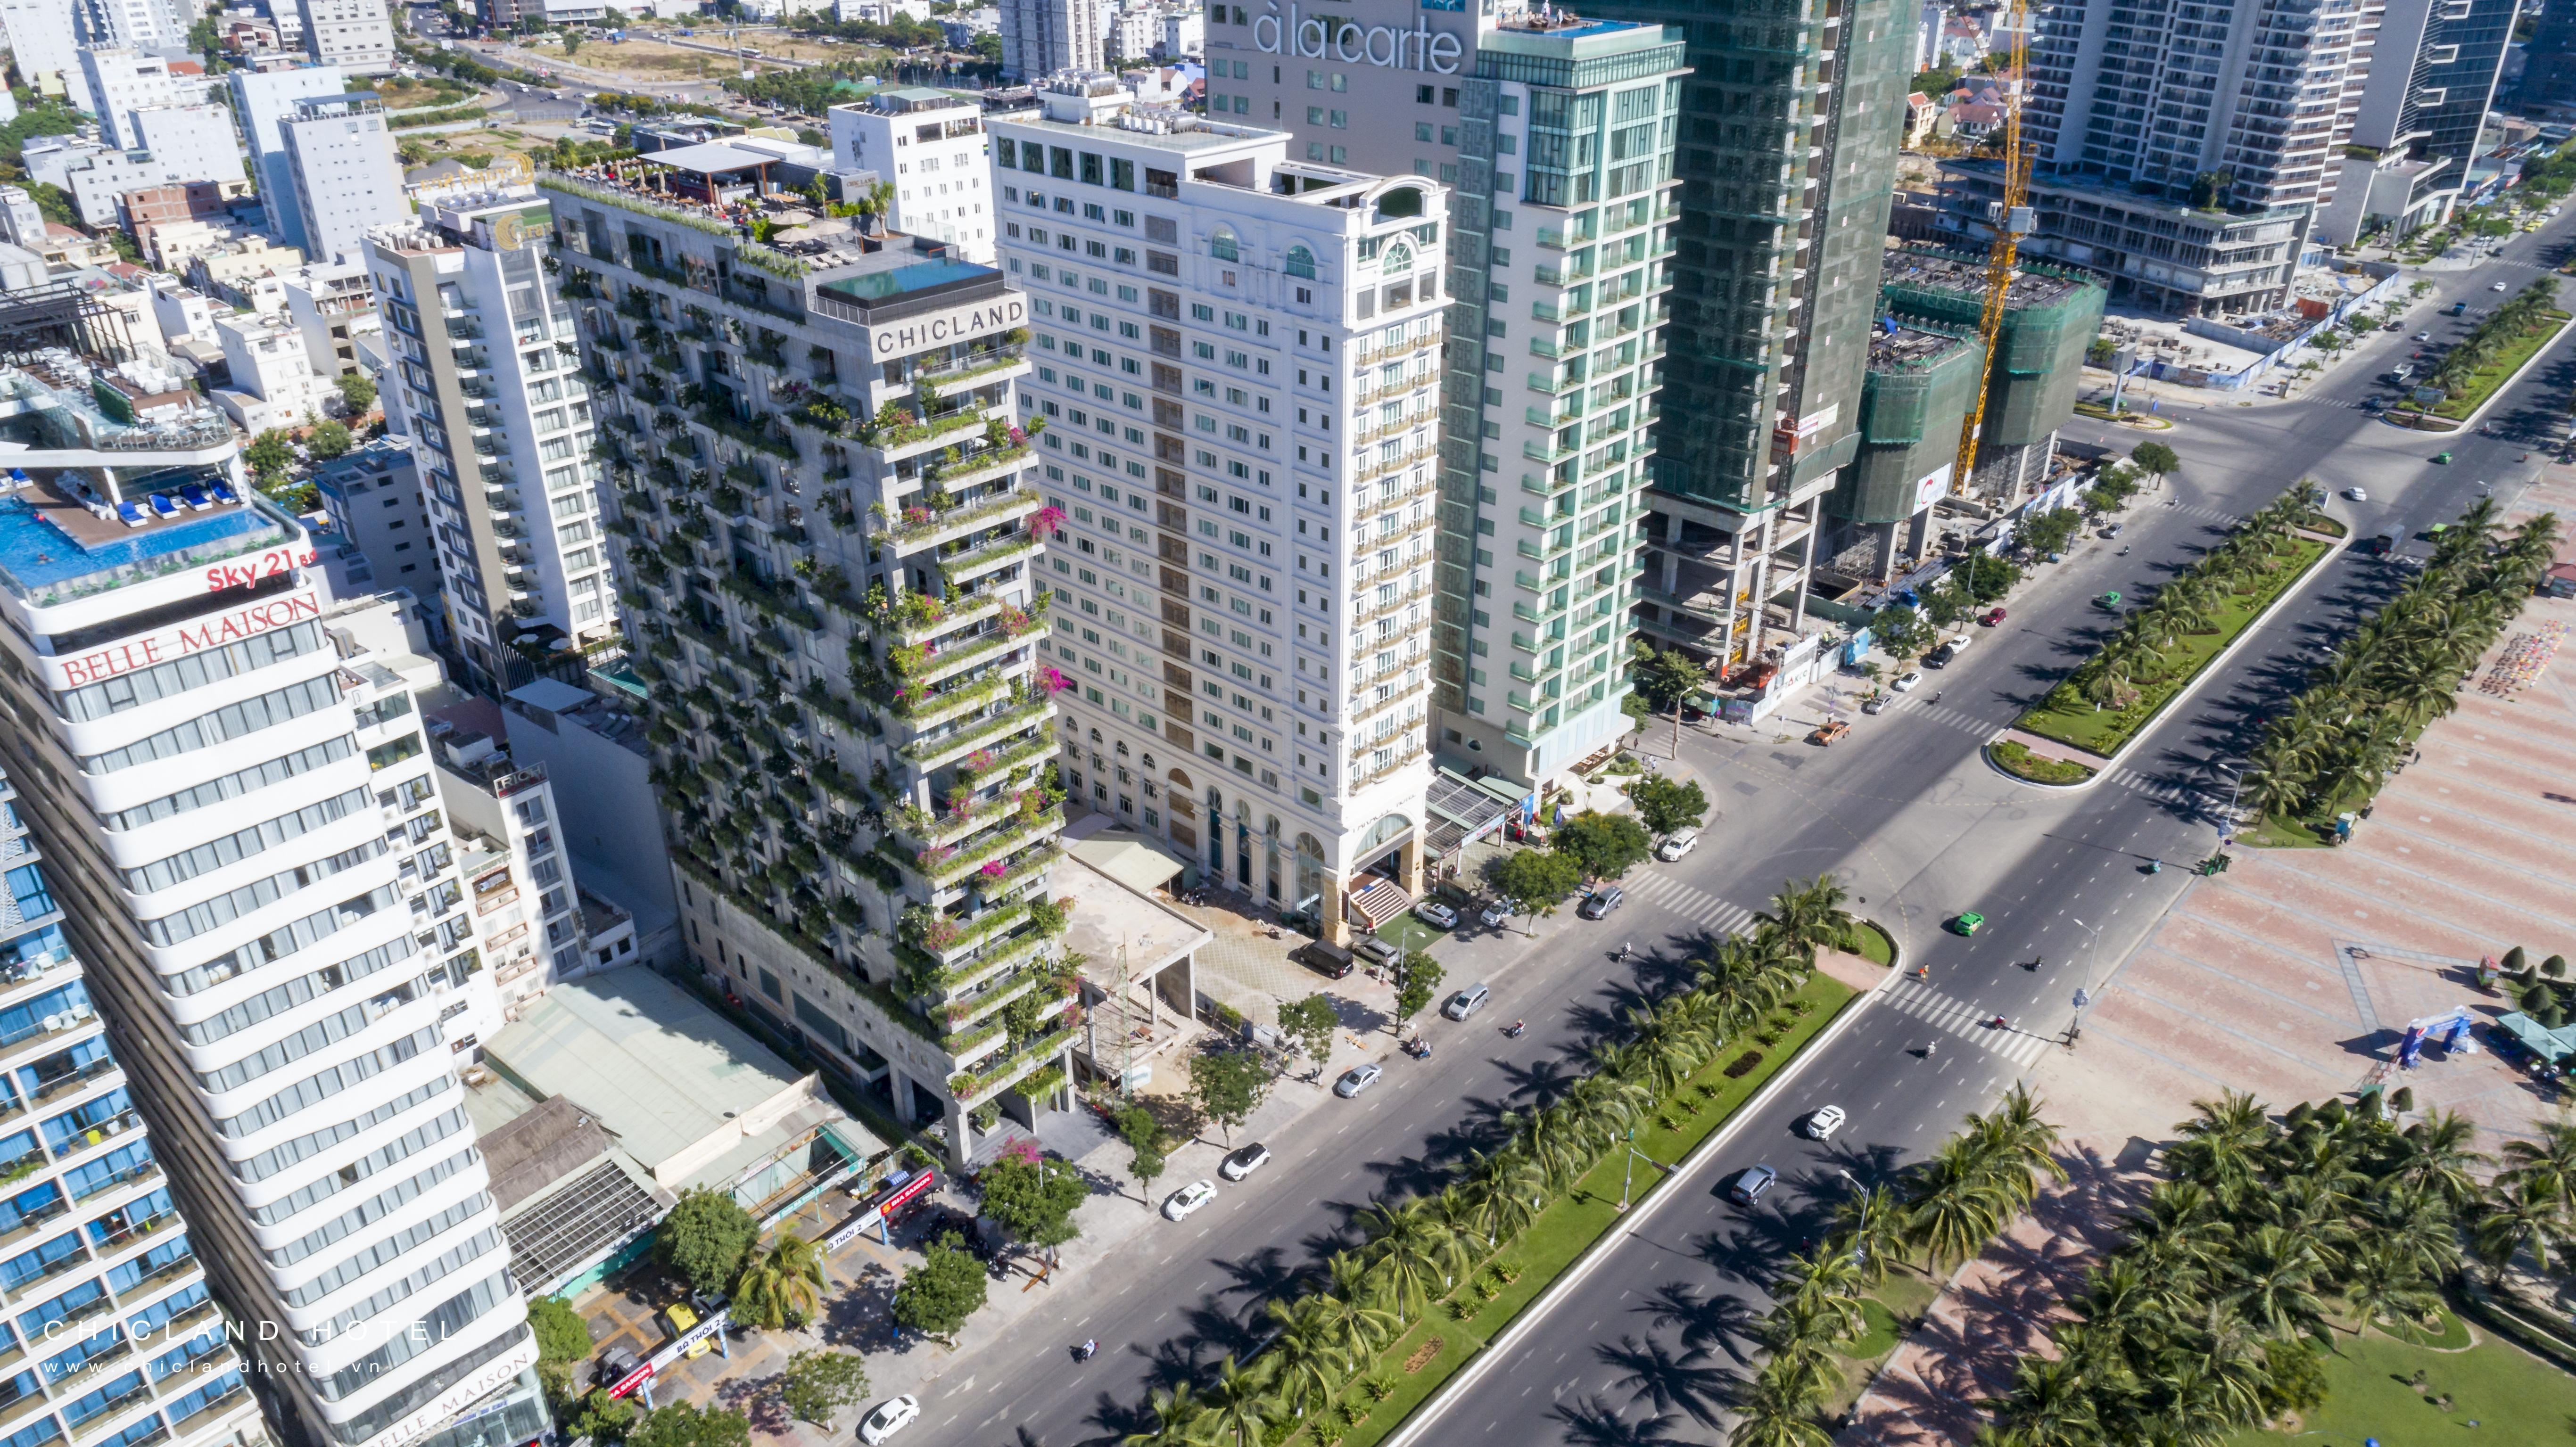 VTN architect | CHICLAND Hotel